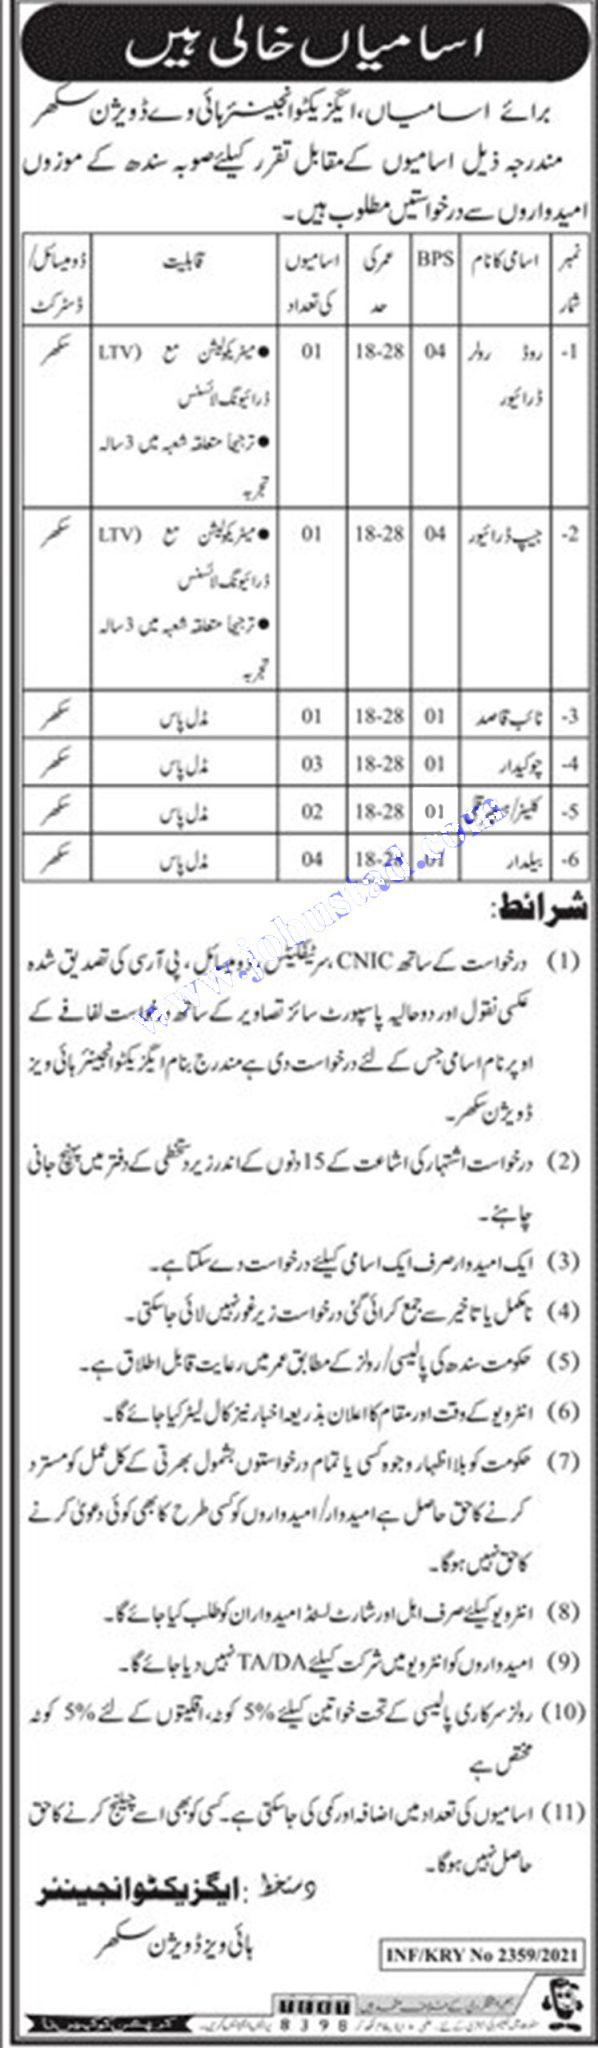 Highways Department Jobs 2021 | Govt of Sindh Jobs Latest Advertisement